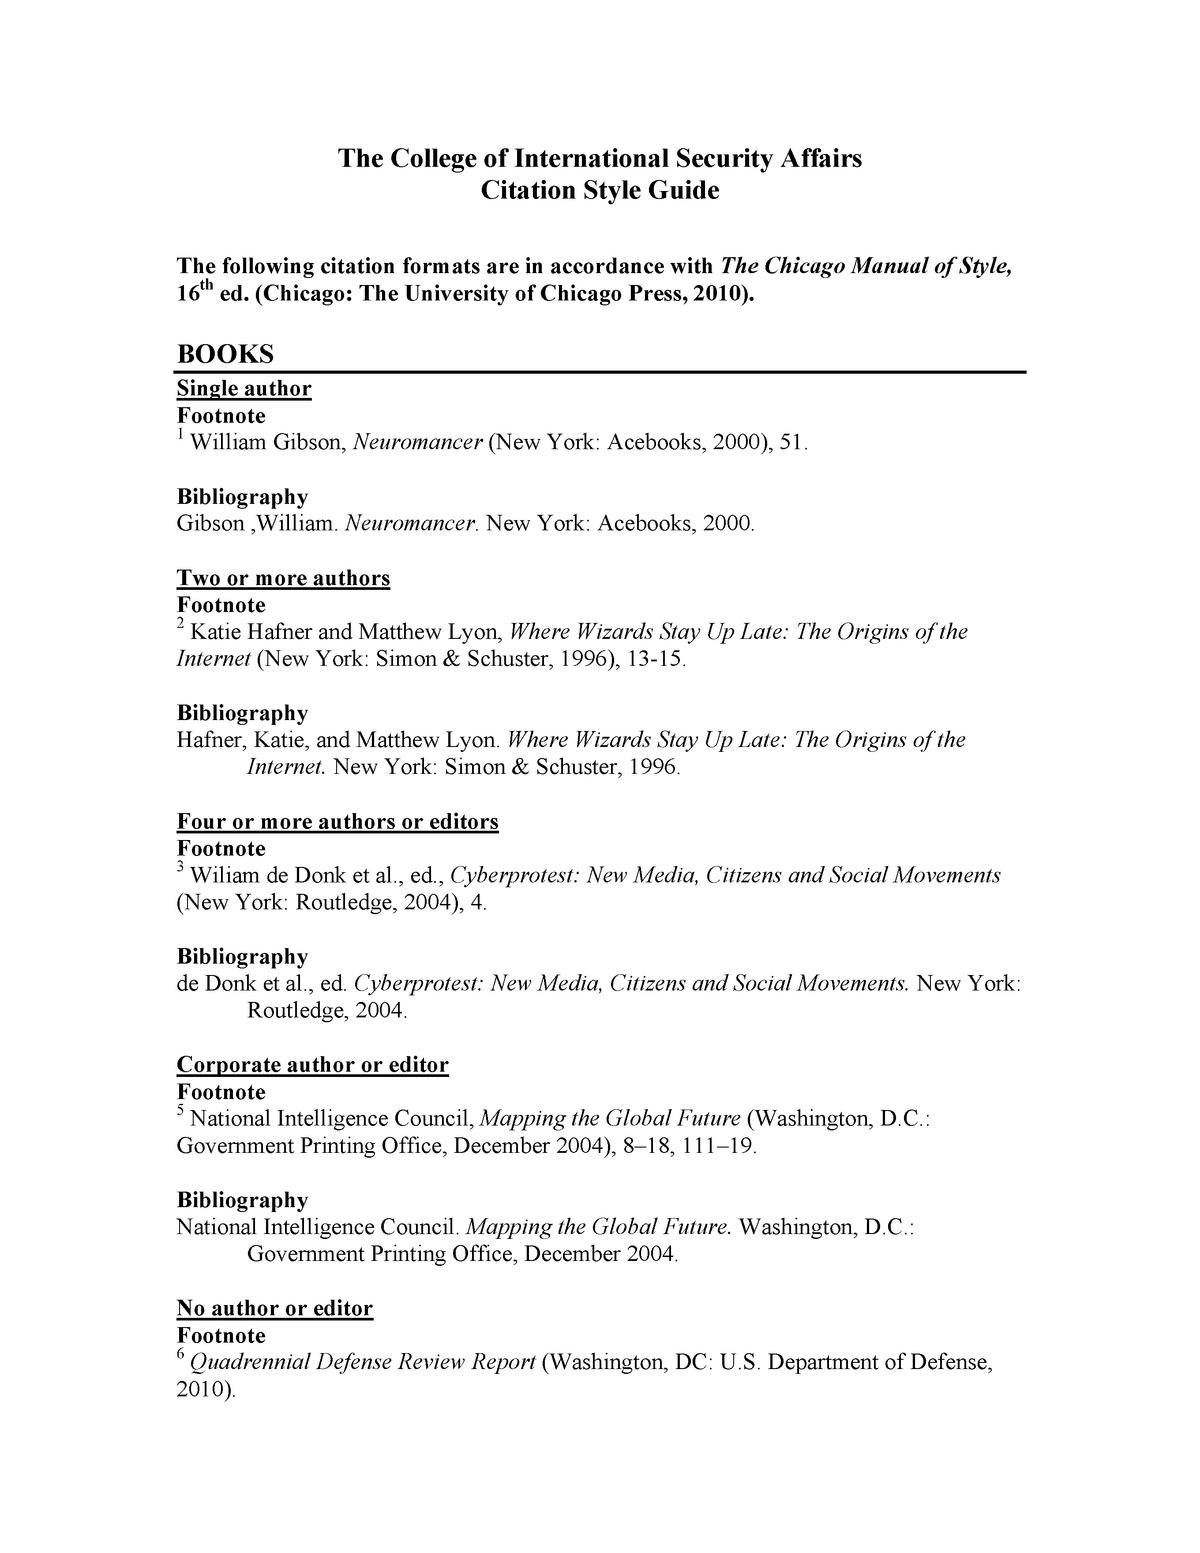 Cisa Citation Style Guide Footnotes Ed Ctf2018 Cisa Studocu